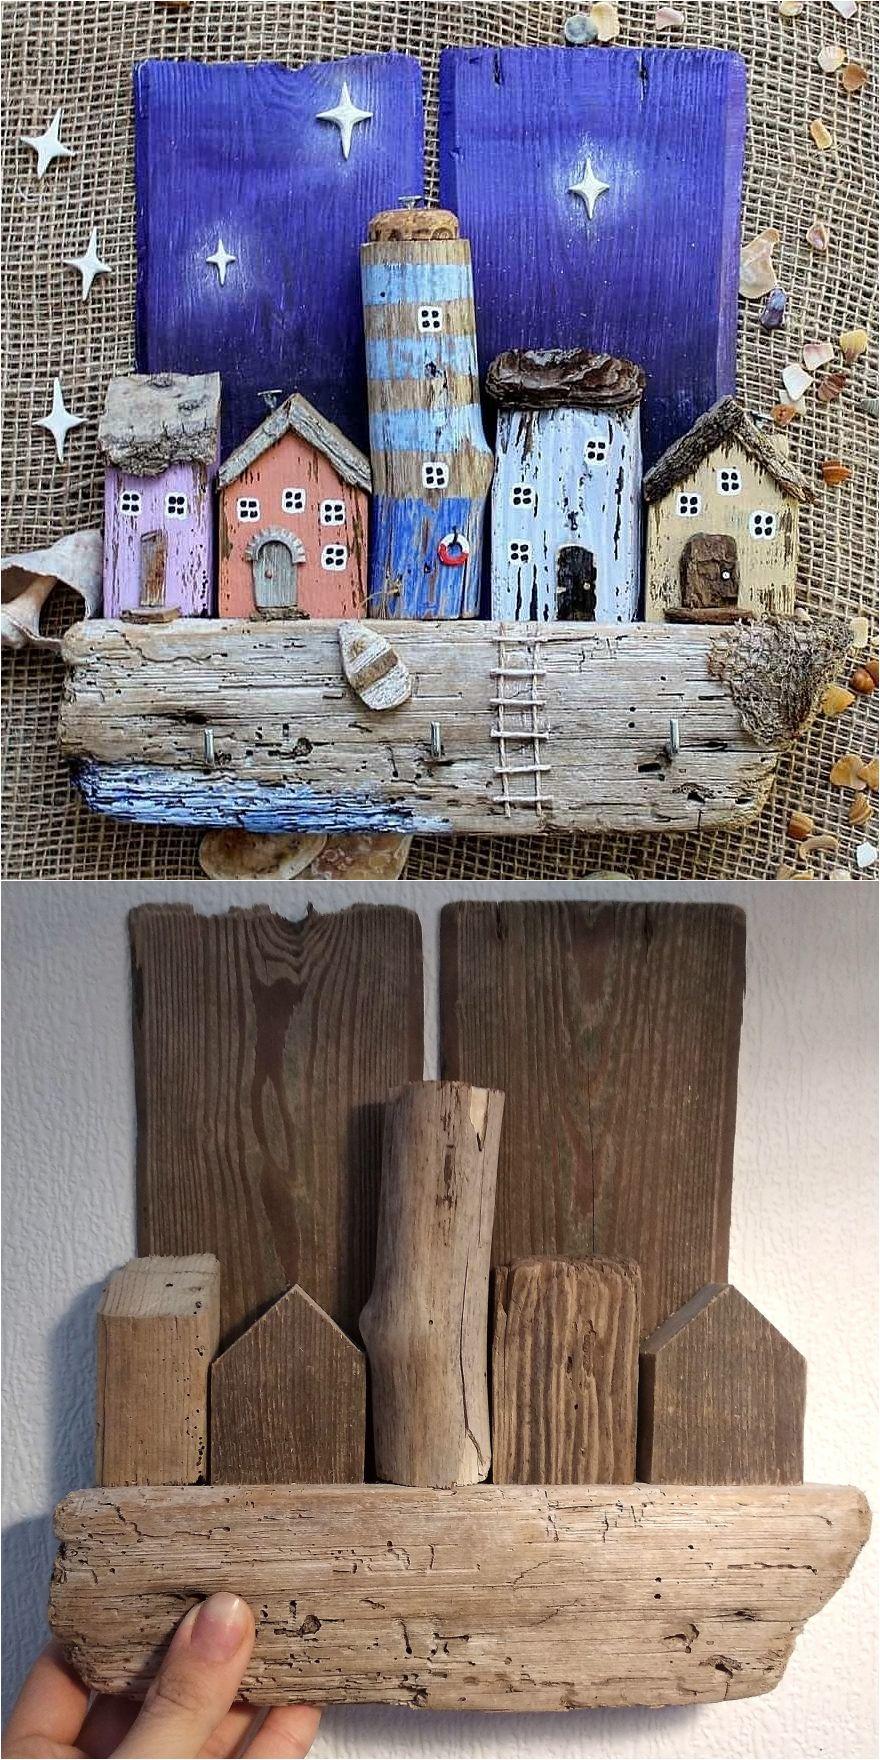 Driftwood Art Decor and Key Holder by HousesAnyaSol on Etsy